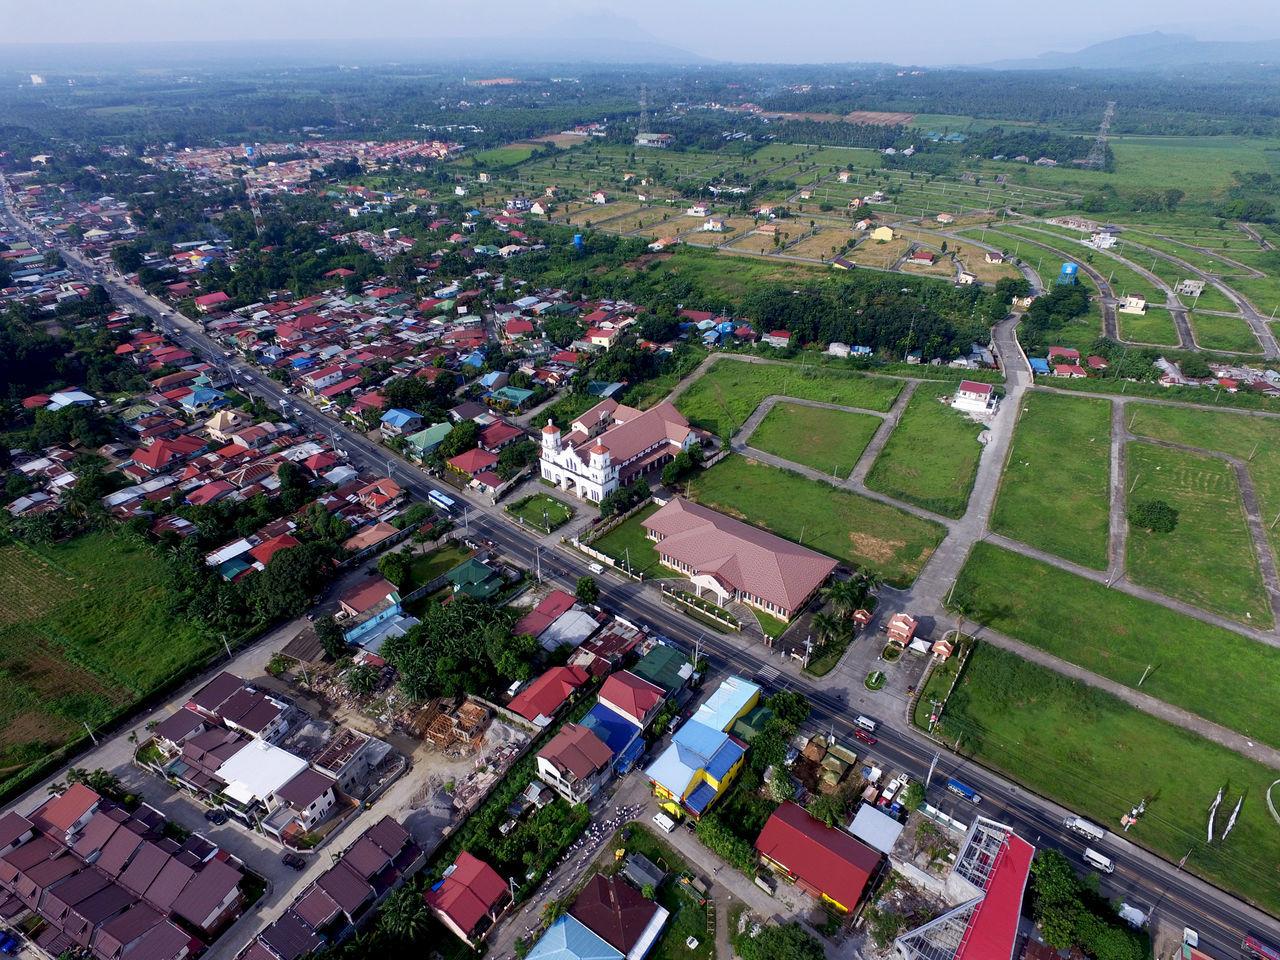 DJI Phantom3 pro #DJI Phantom 3 #tanauan Aerial View Sky First Eyeem Photo